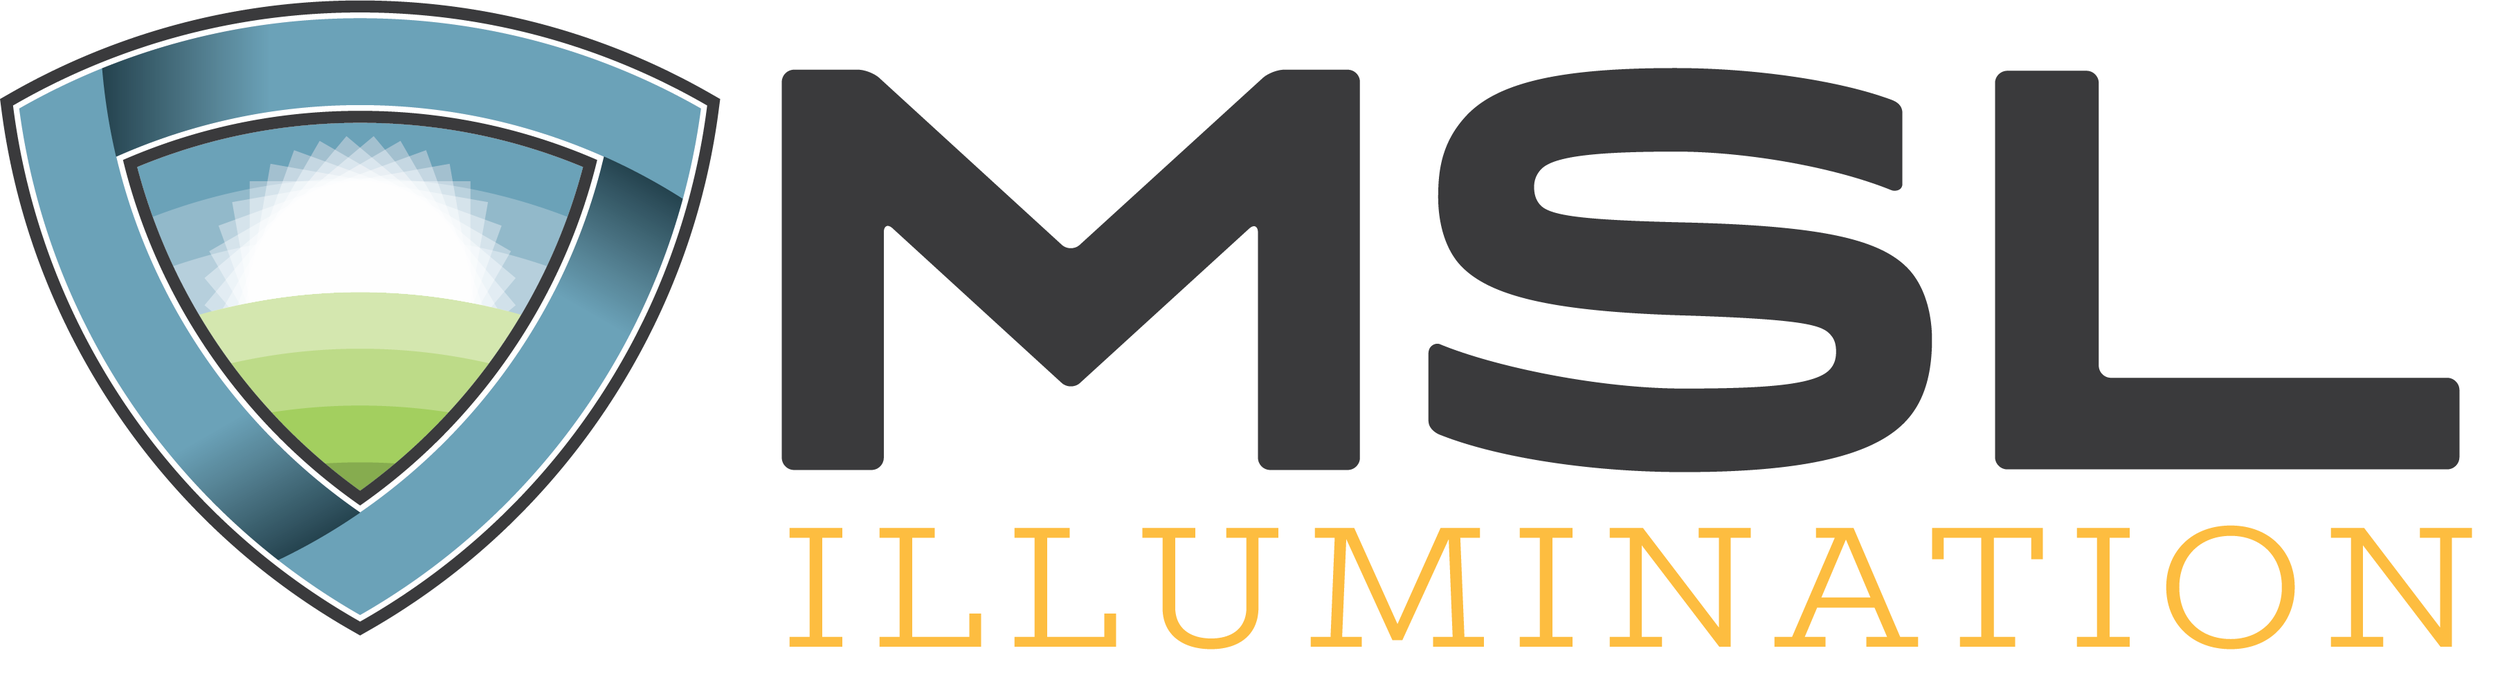 horizontal_MSL_Illumination_logo.png